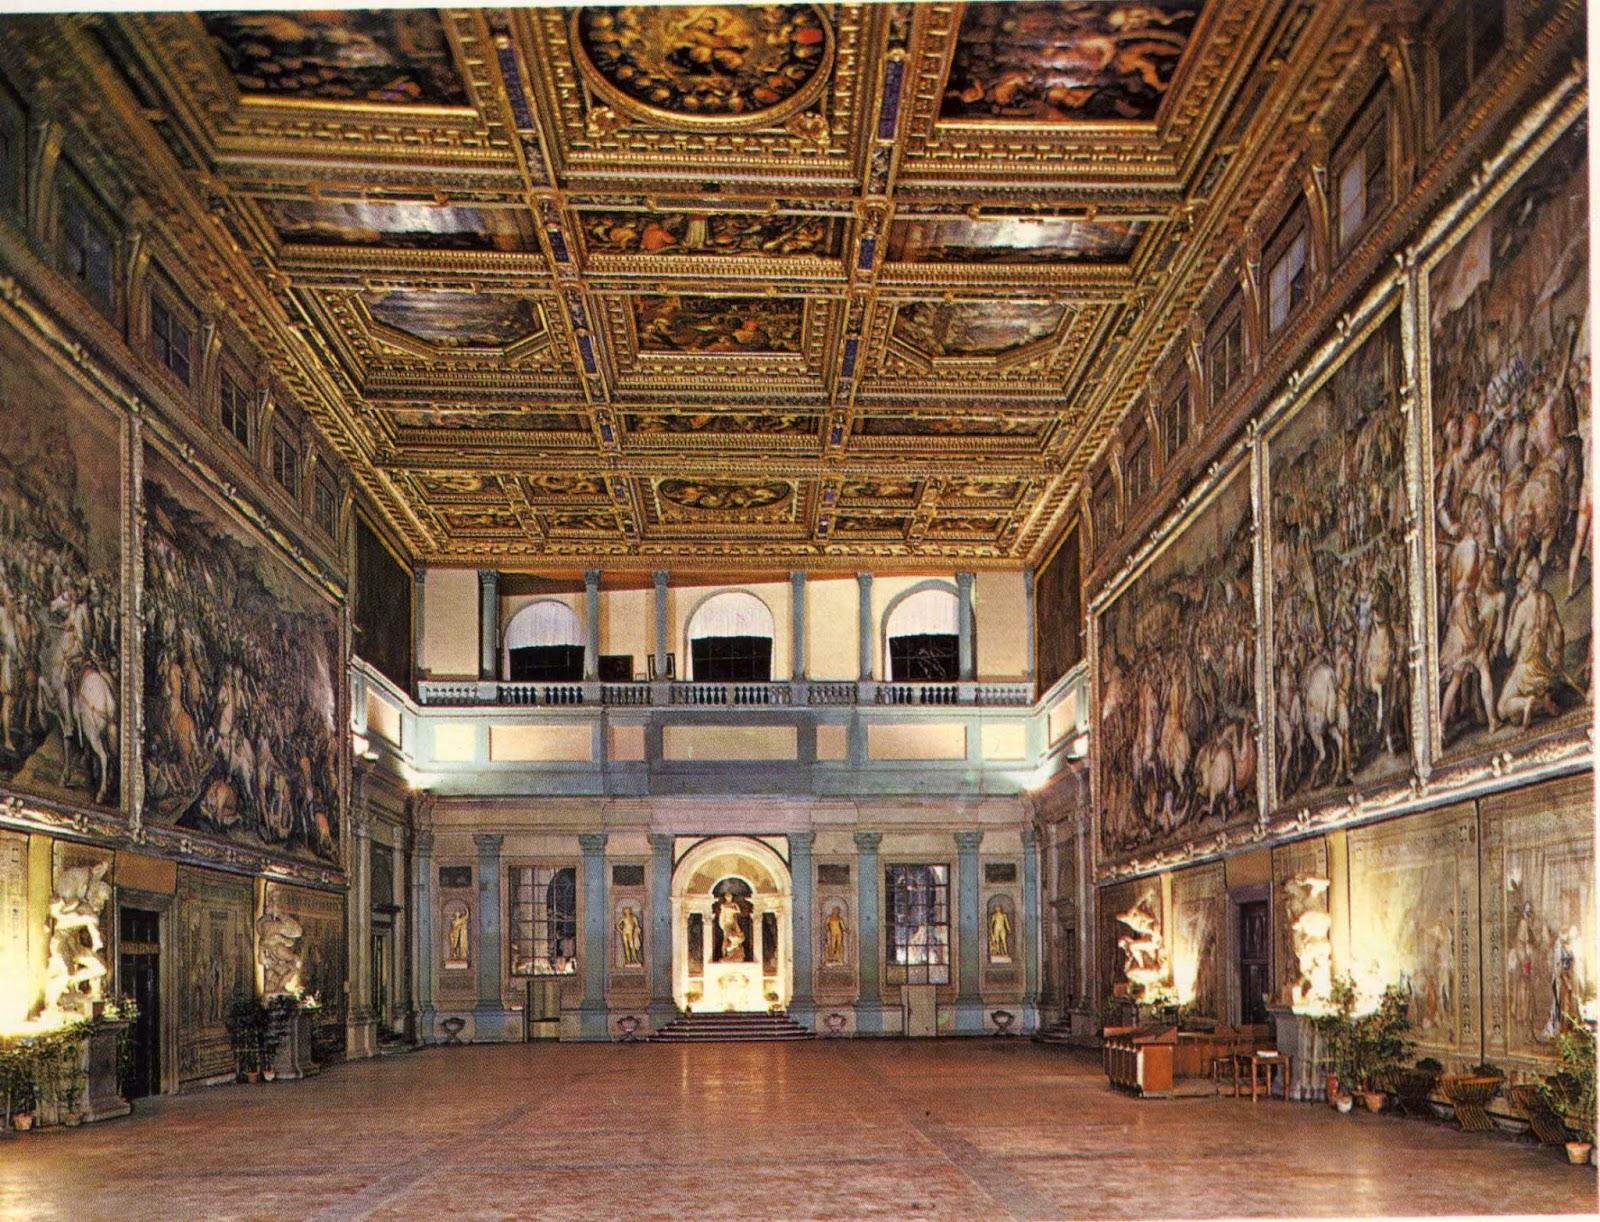 Fuente: murallologo.blogspot.com